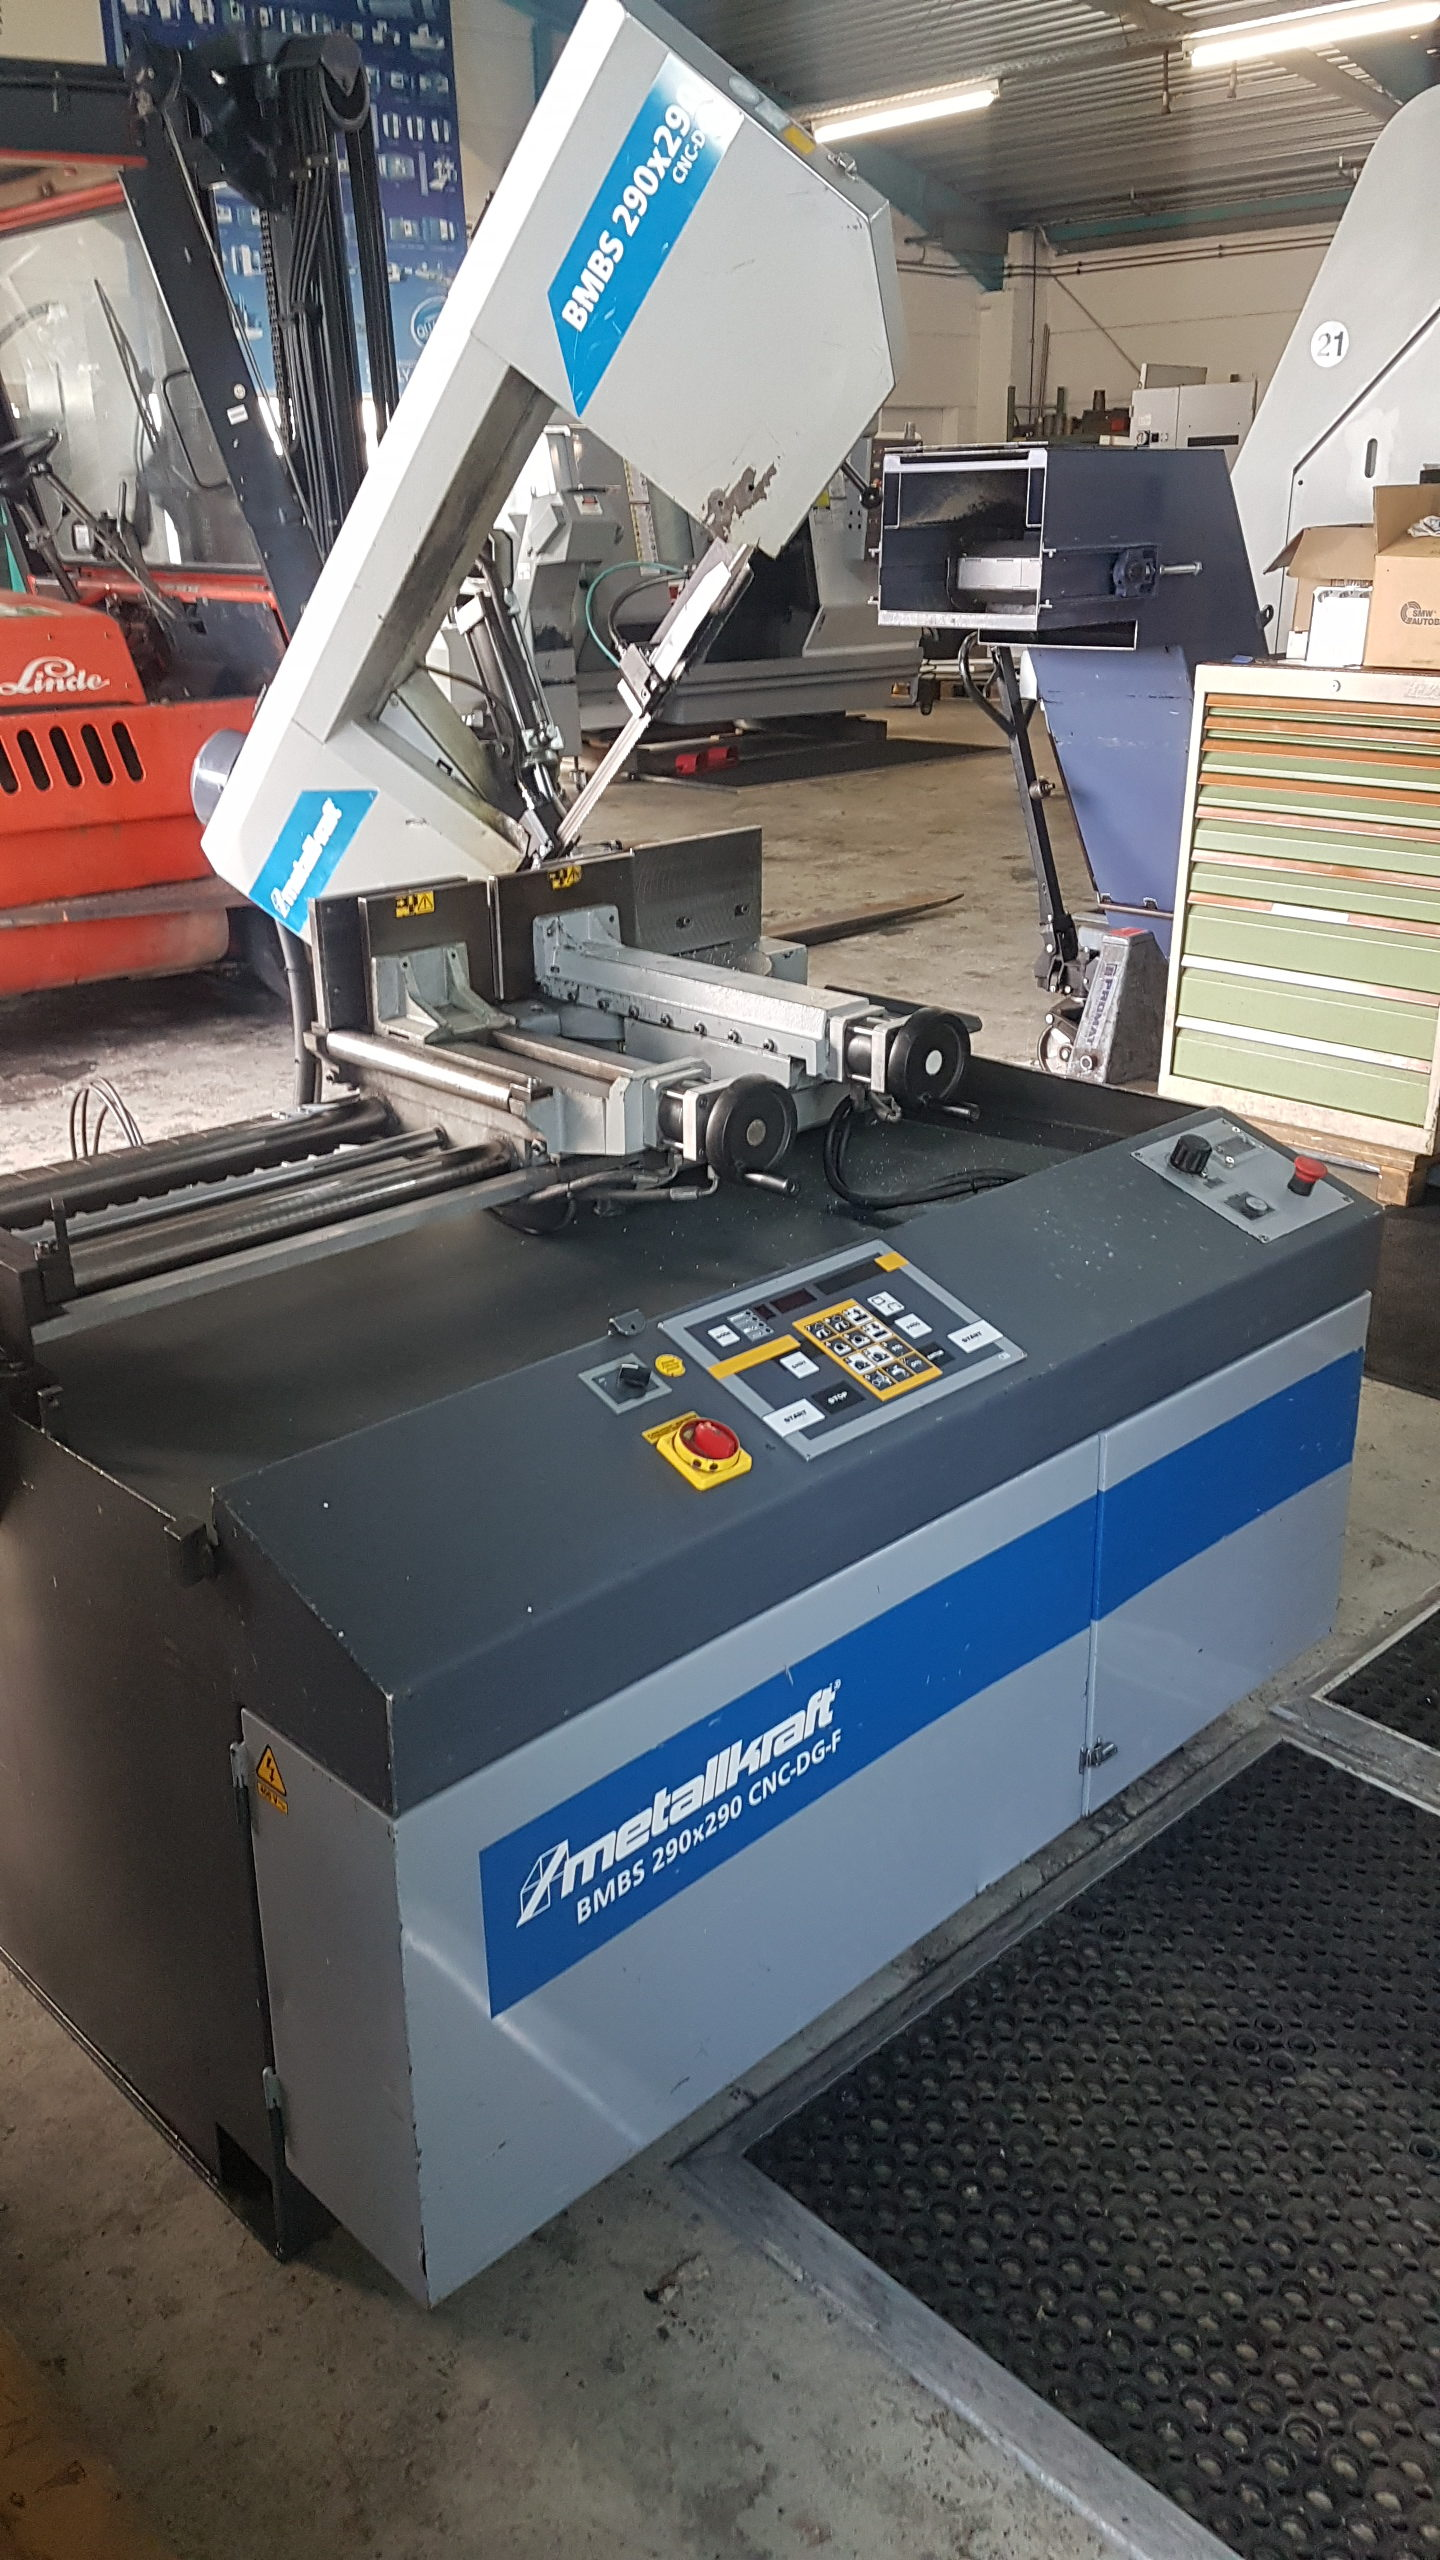 CNC- Sägeautomat mit Doppelgehrung neu im Lager